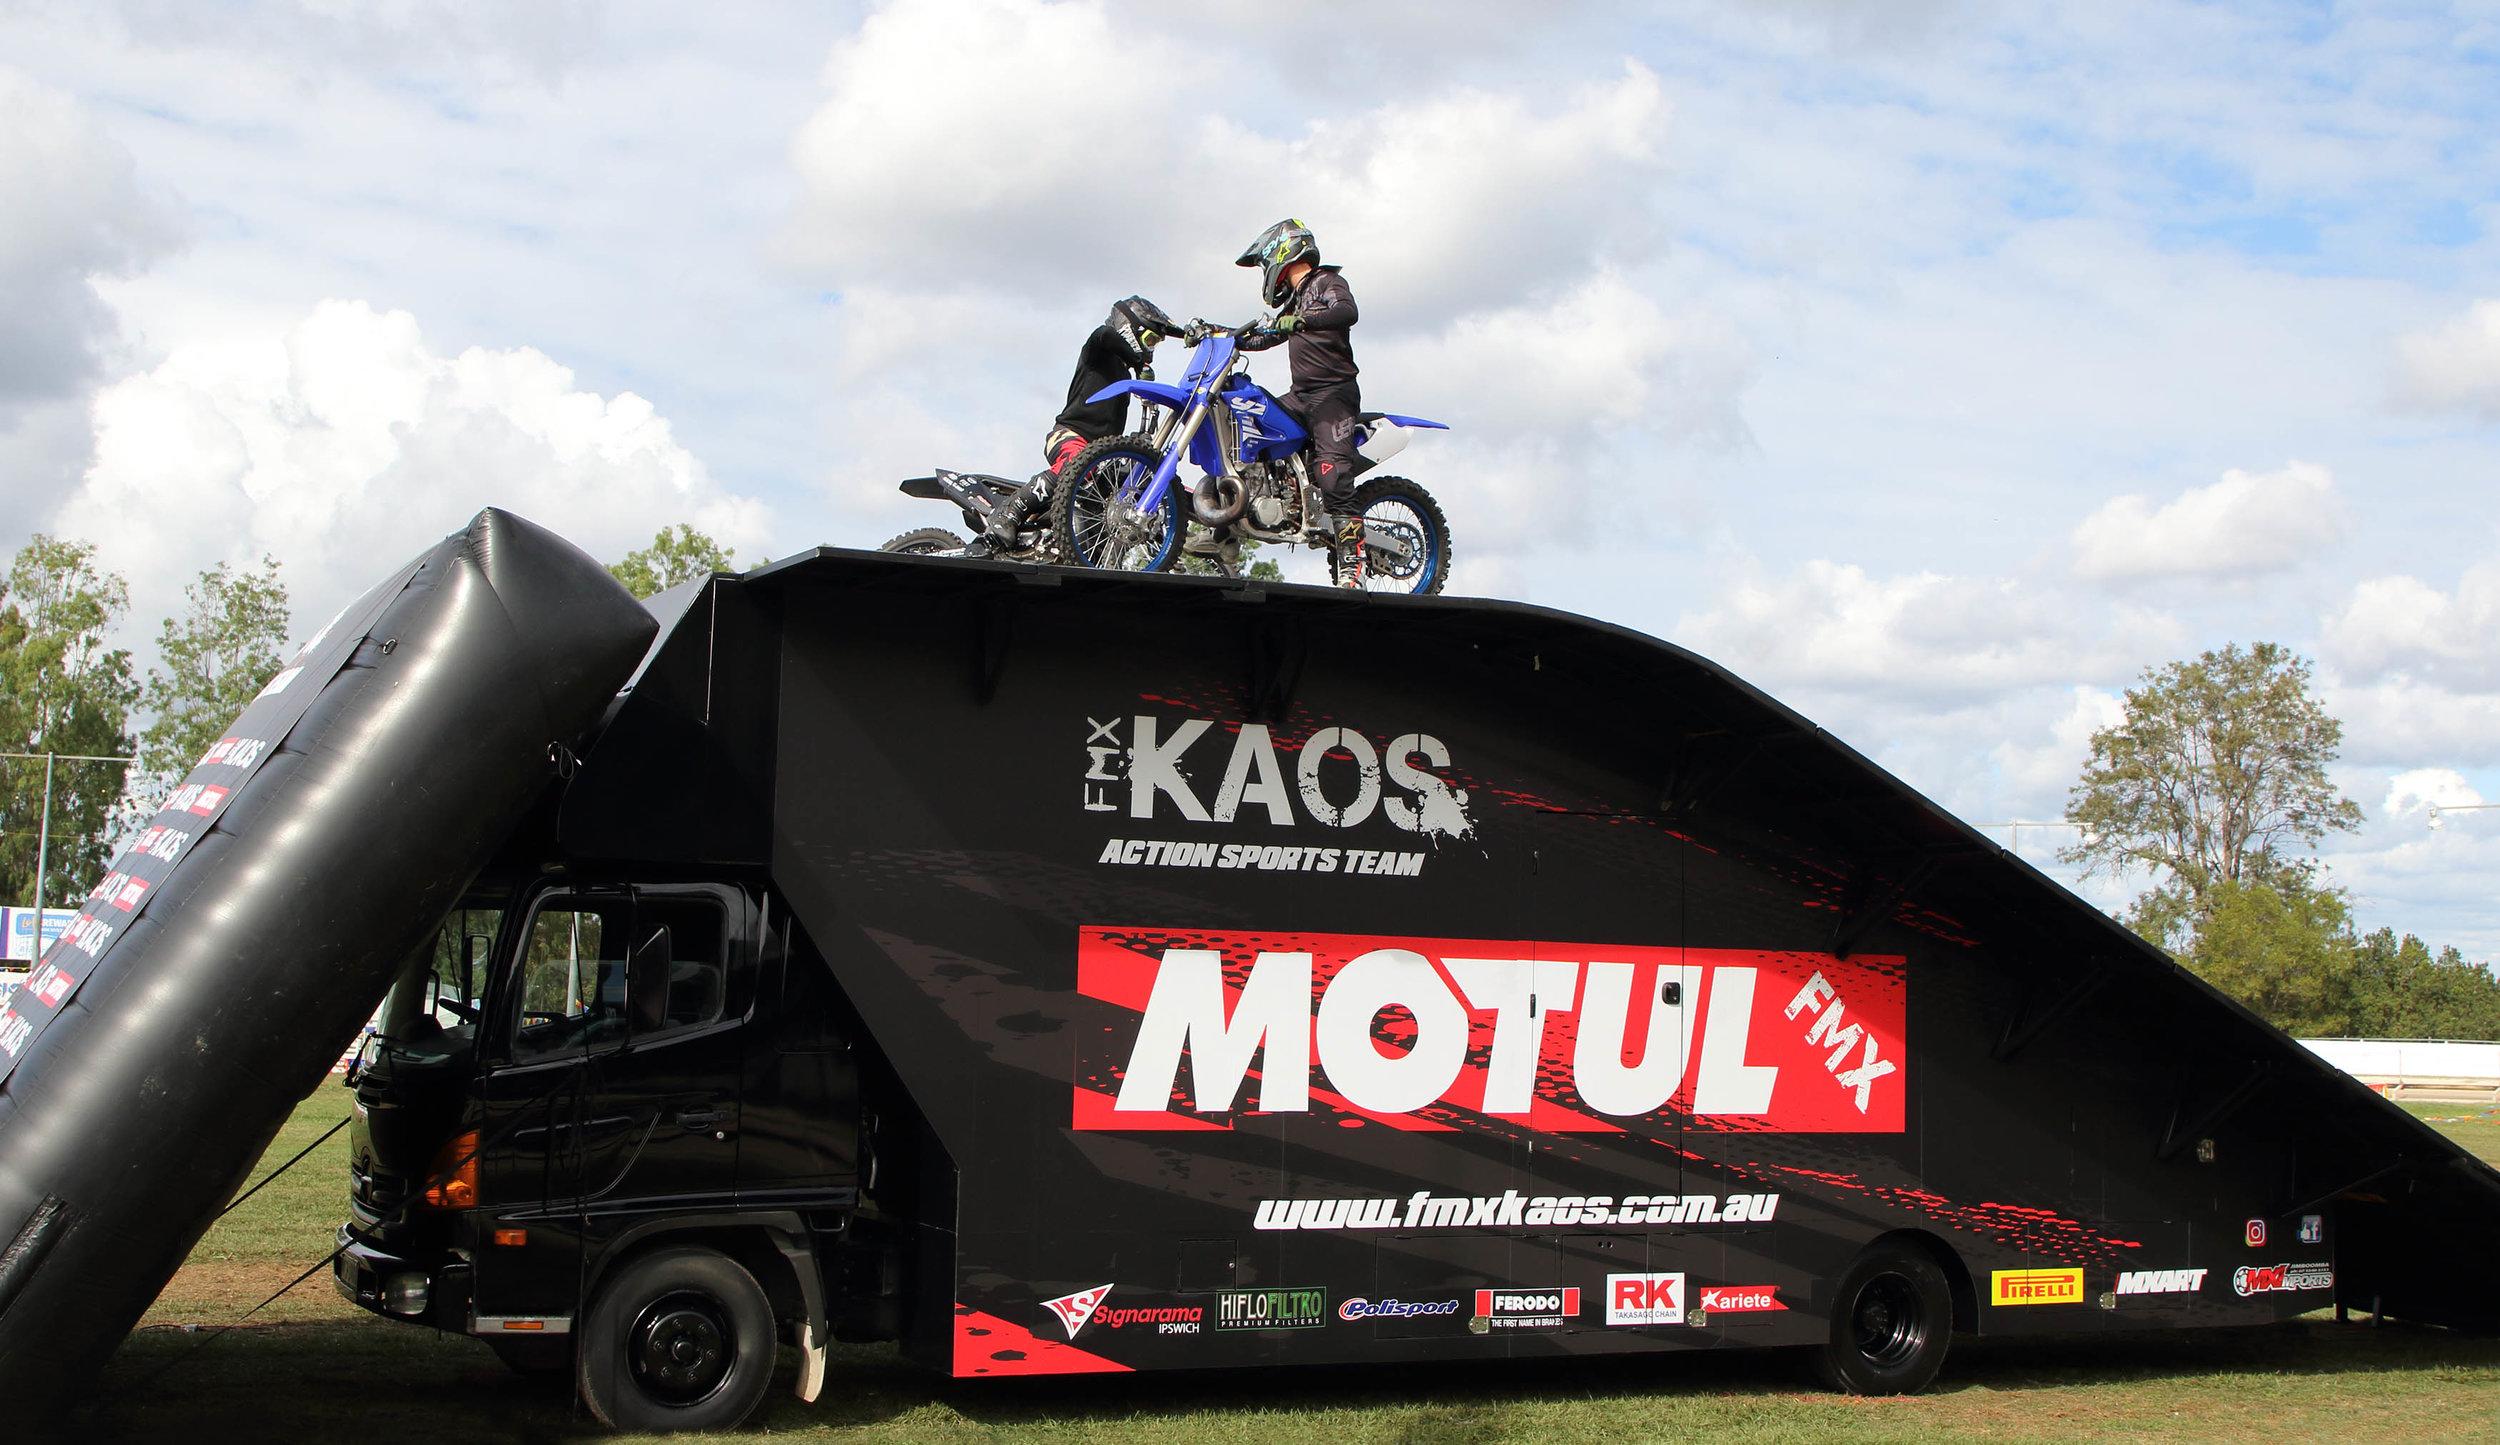 FMX Kaos Truck Ipswich Show 2019.jpg